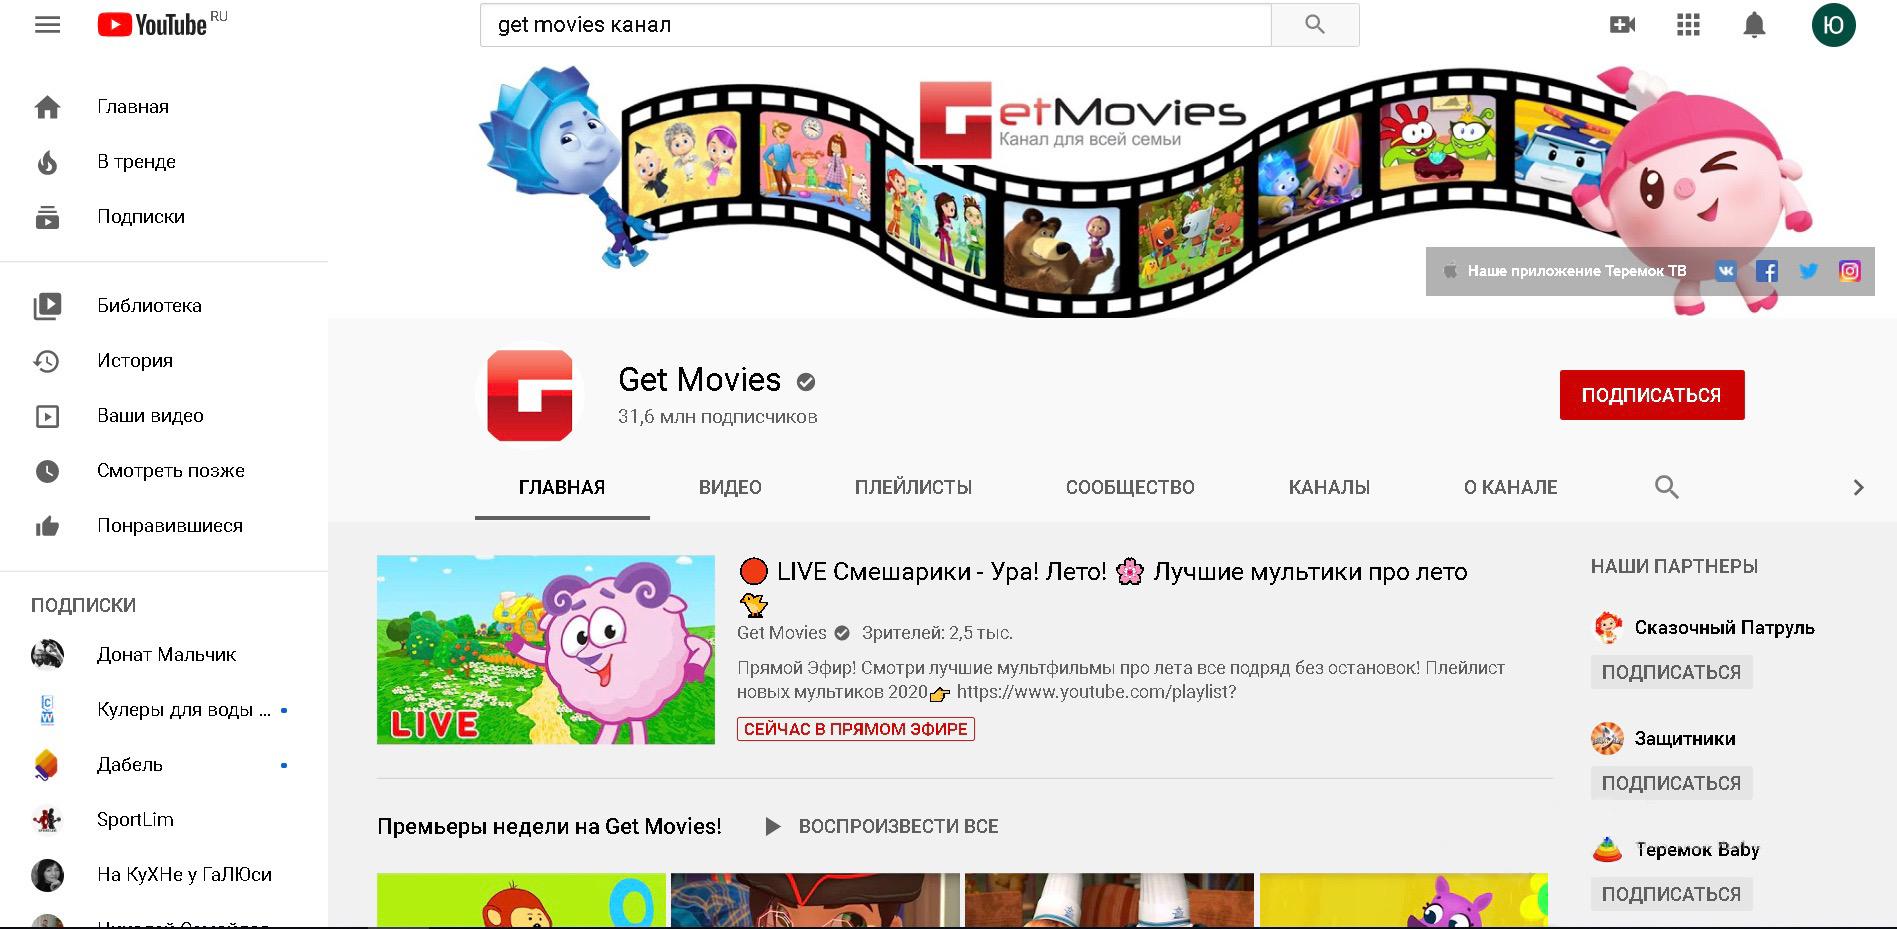 Пример трейлера канала Get Movies